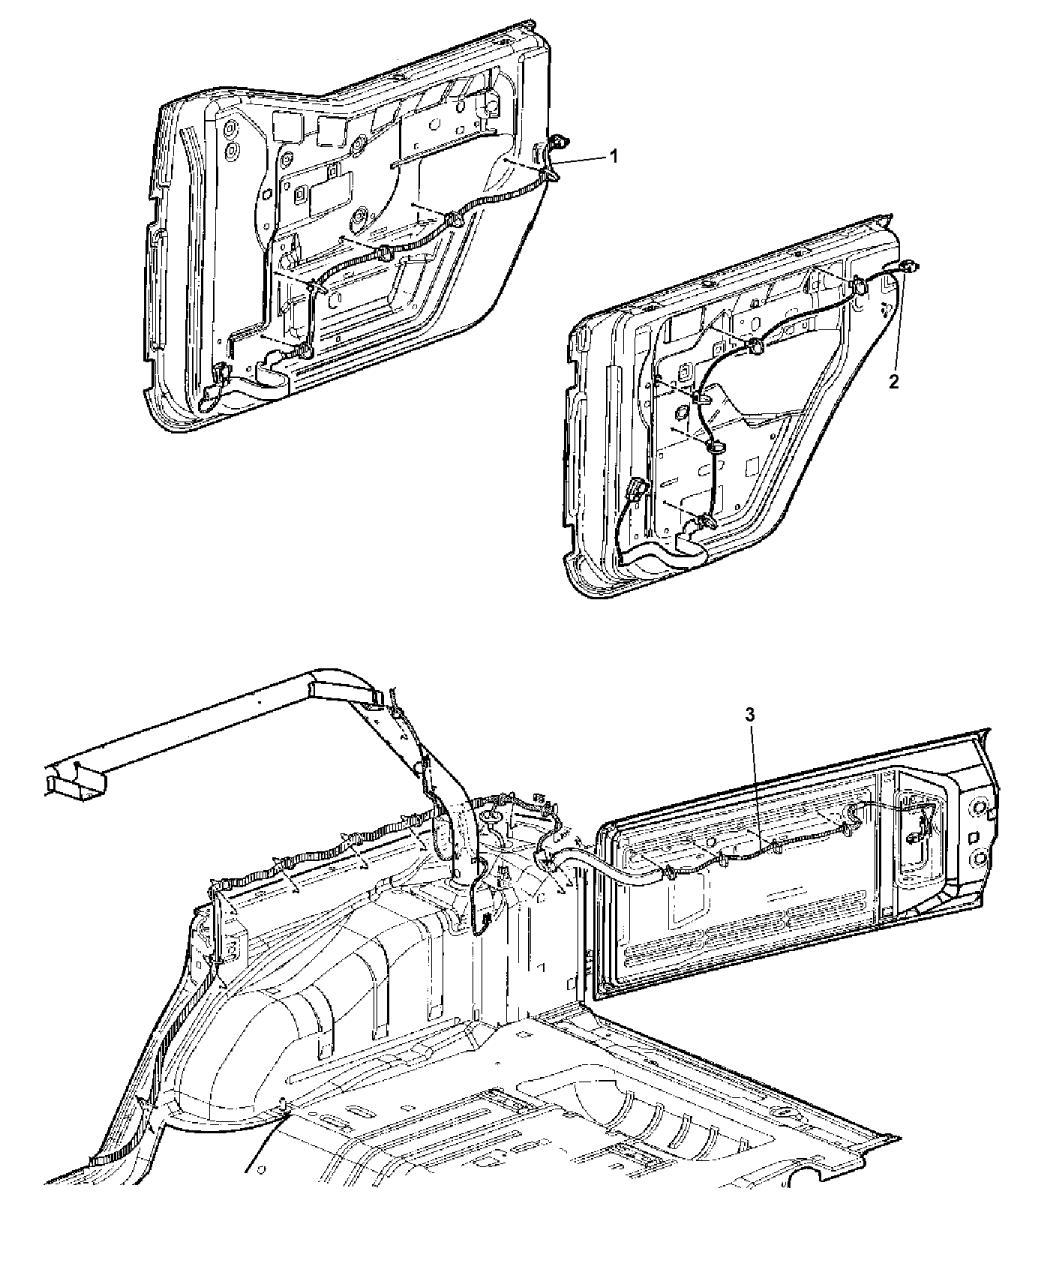 Jeep Jk Rear Door Wiring Diagram • Wiring Diagram For Free